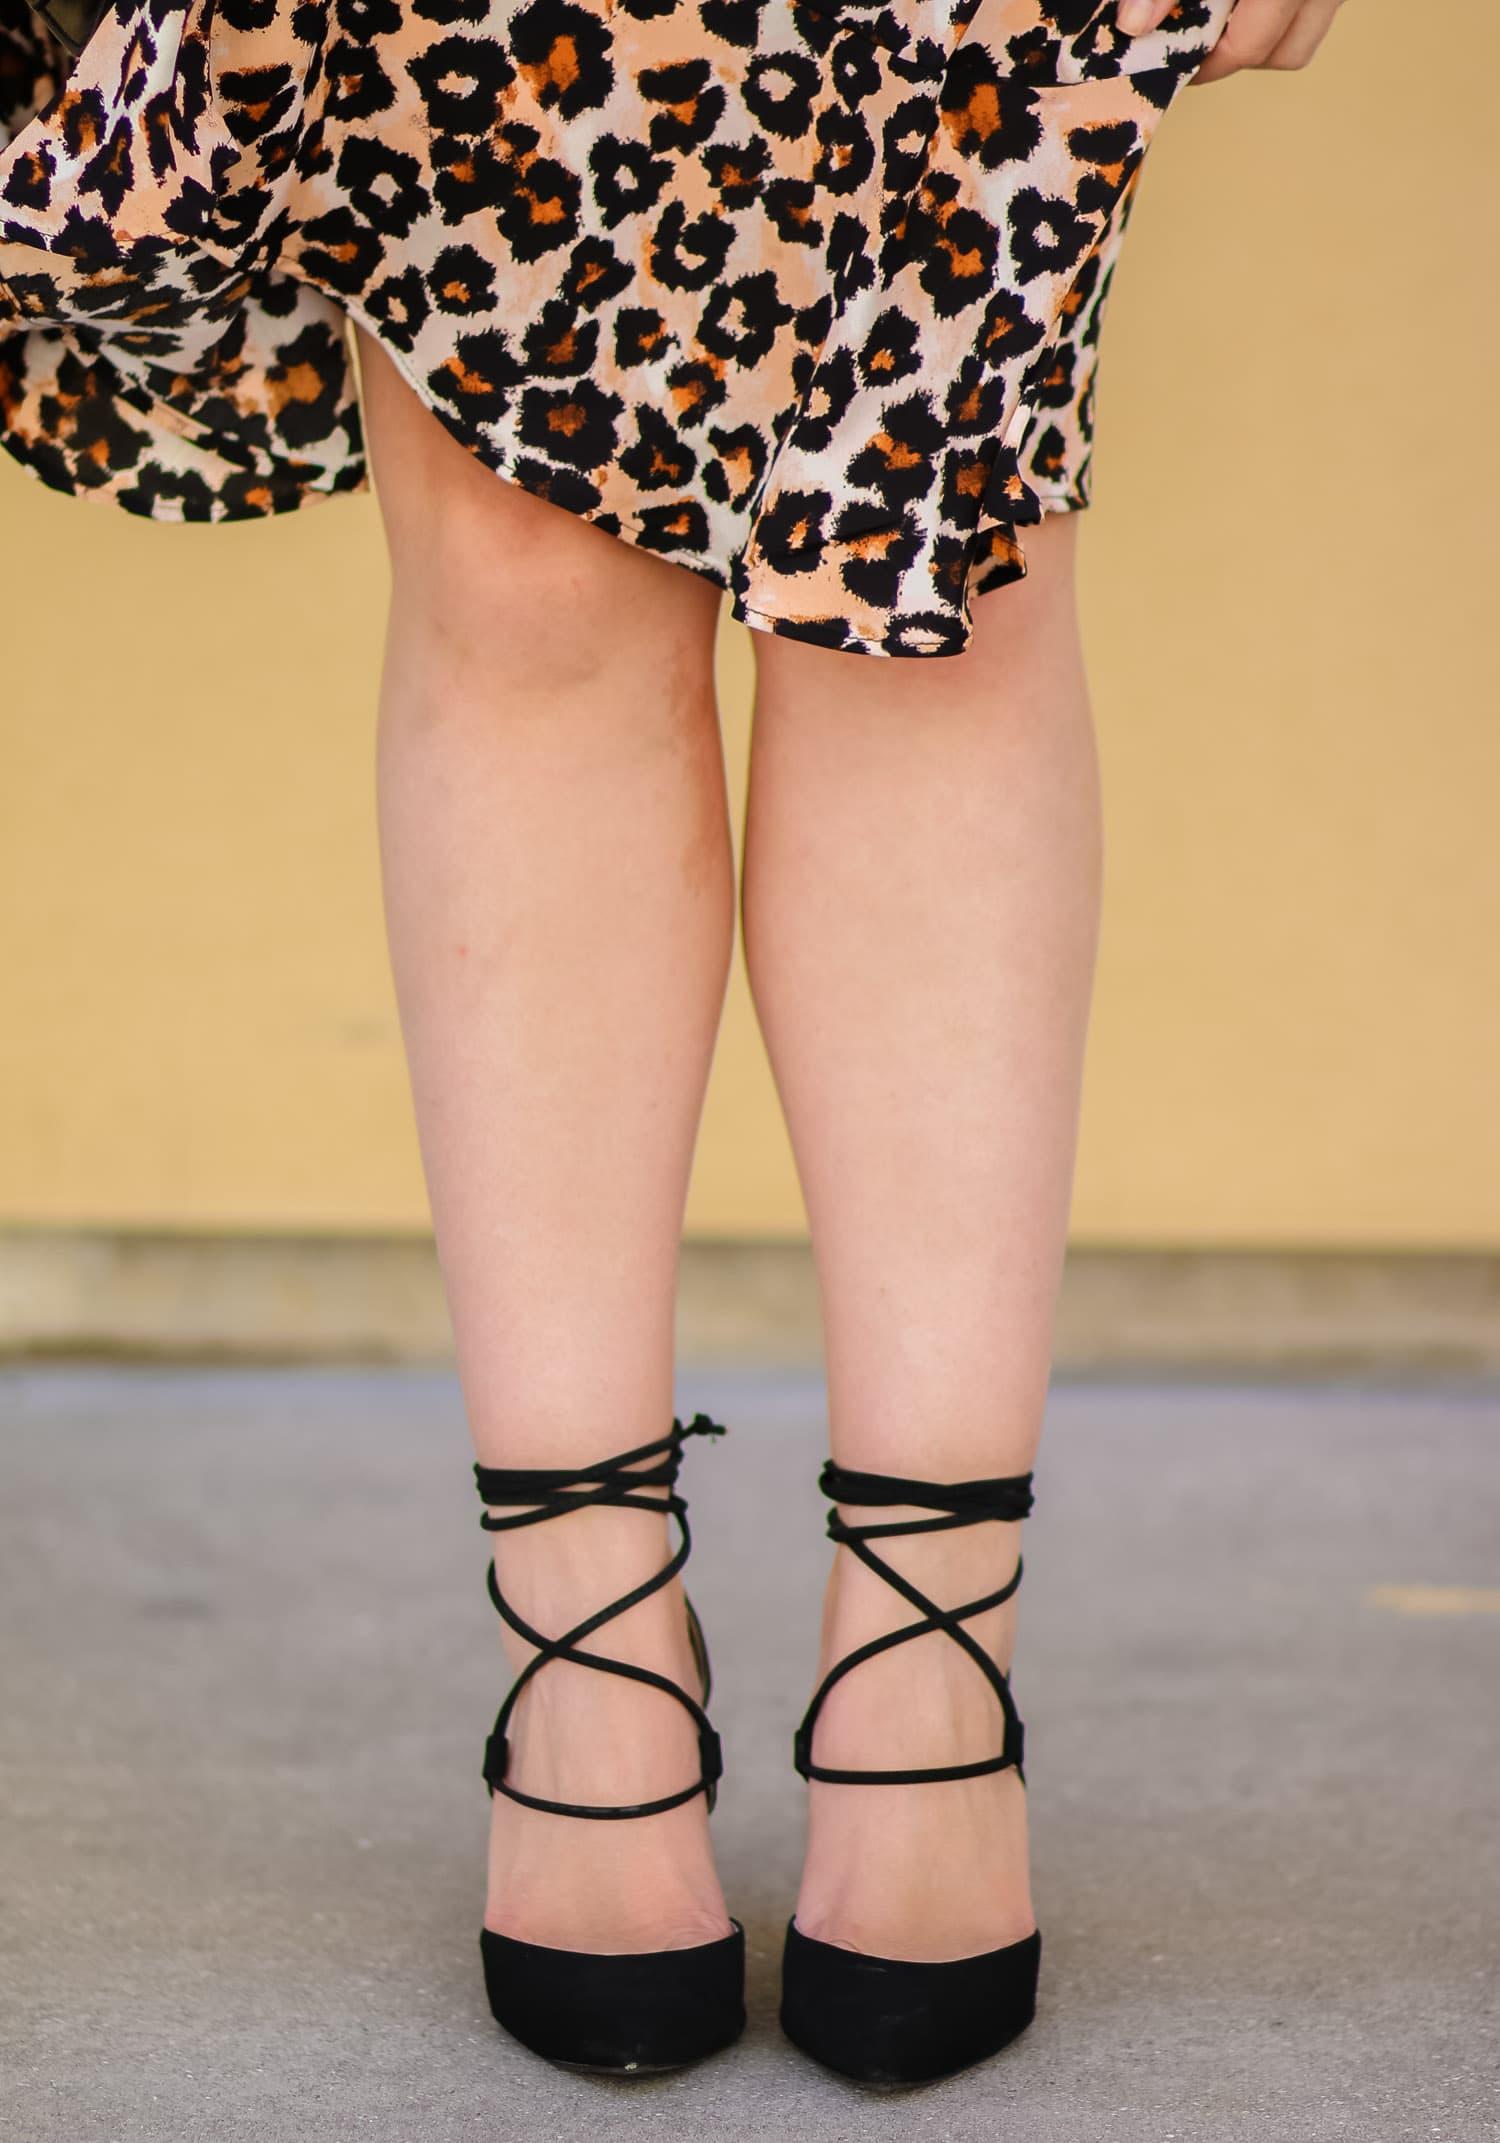 leopard-print-skirt-black-lace-up-heels-1072